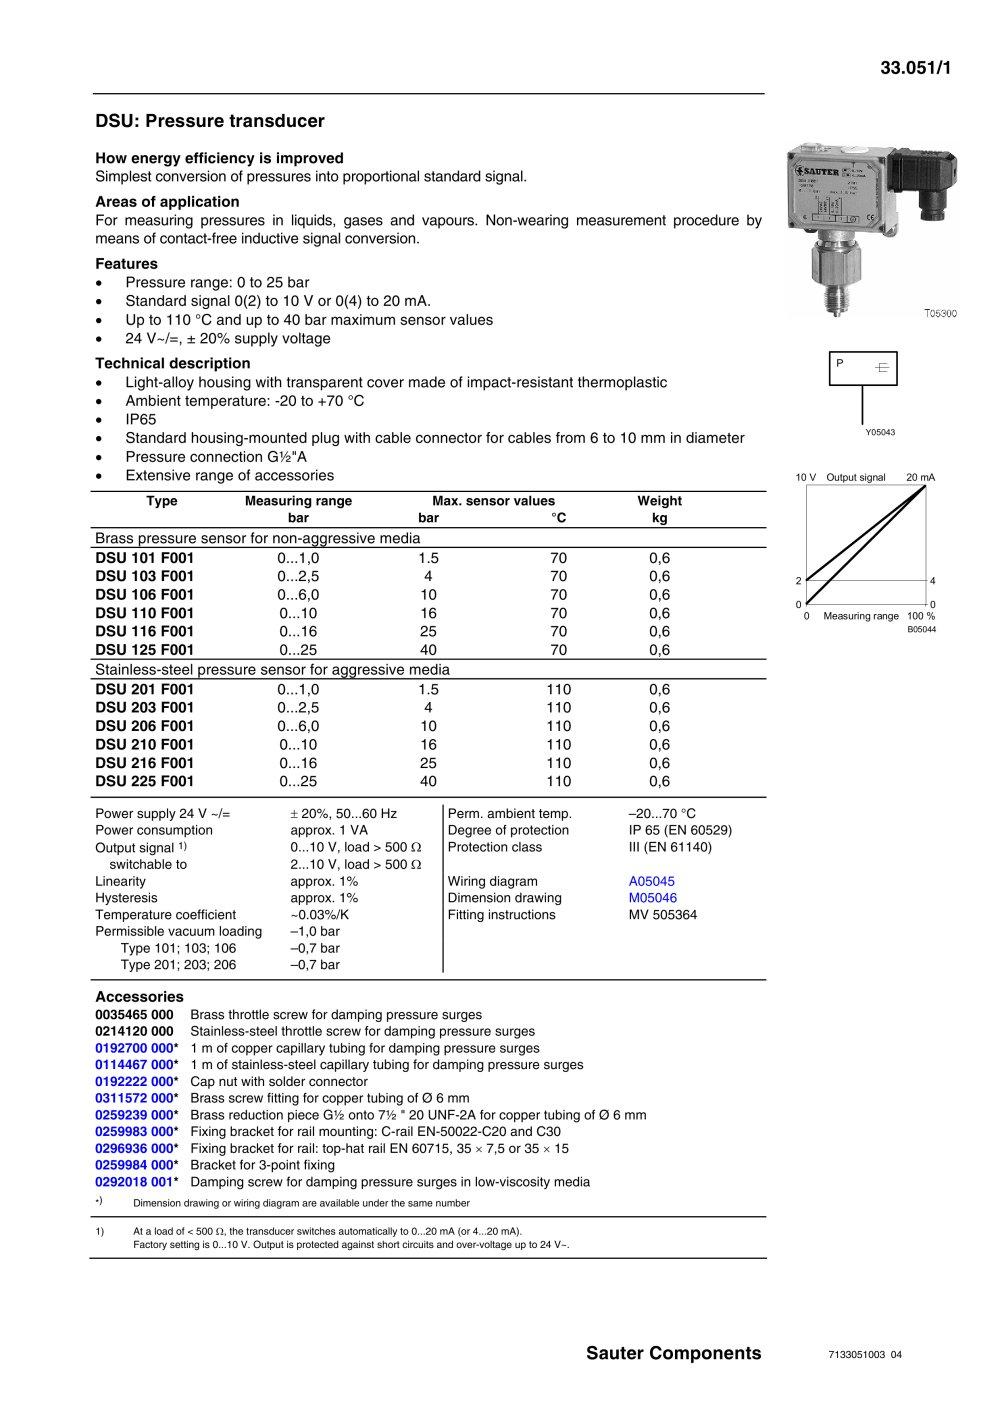 pressure transducer 176399_1b?resize\\\=665%2C940 danfoss pressure transmitter wiring diagram thermostat wiring  at honlapkeszites.co